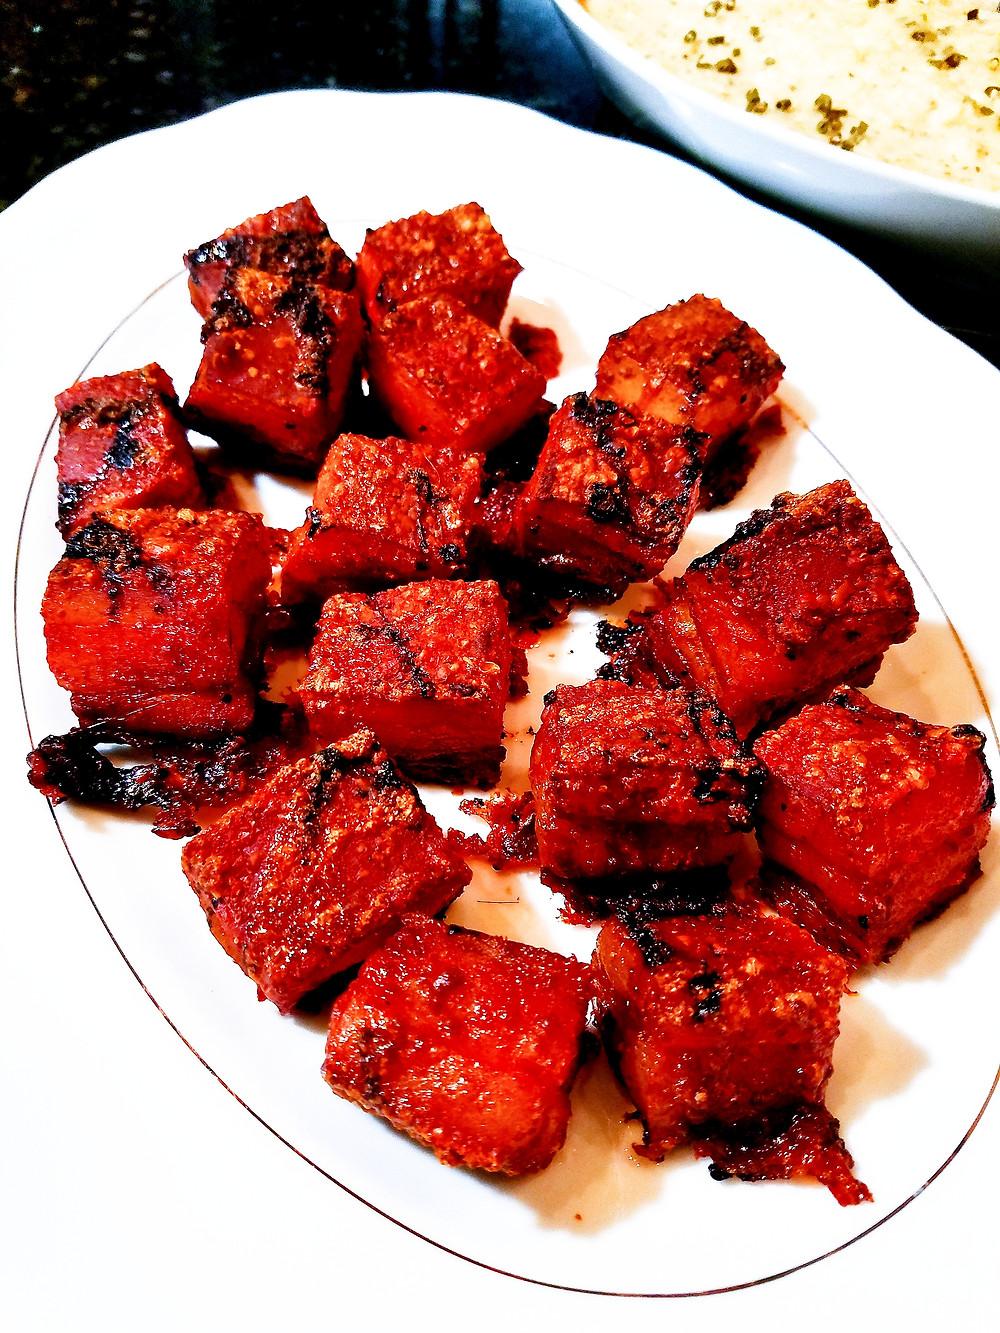 Salty, Sticky Sous Vide Pork Belly (Gluten-free, soy-free, dairy-free, grain-free)